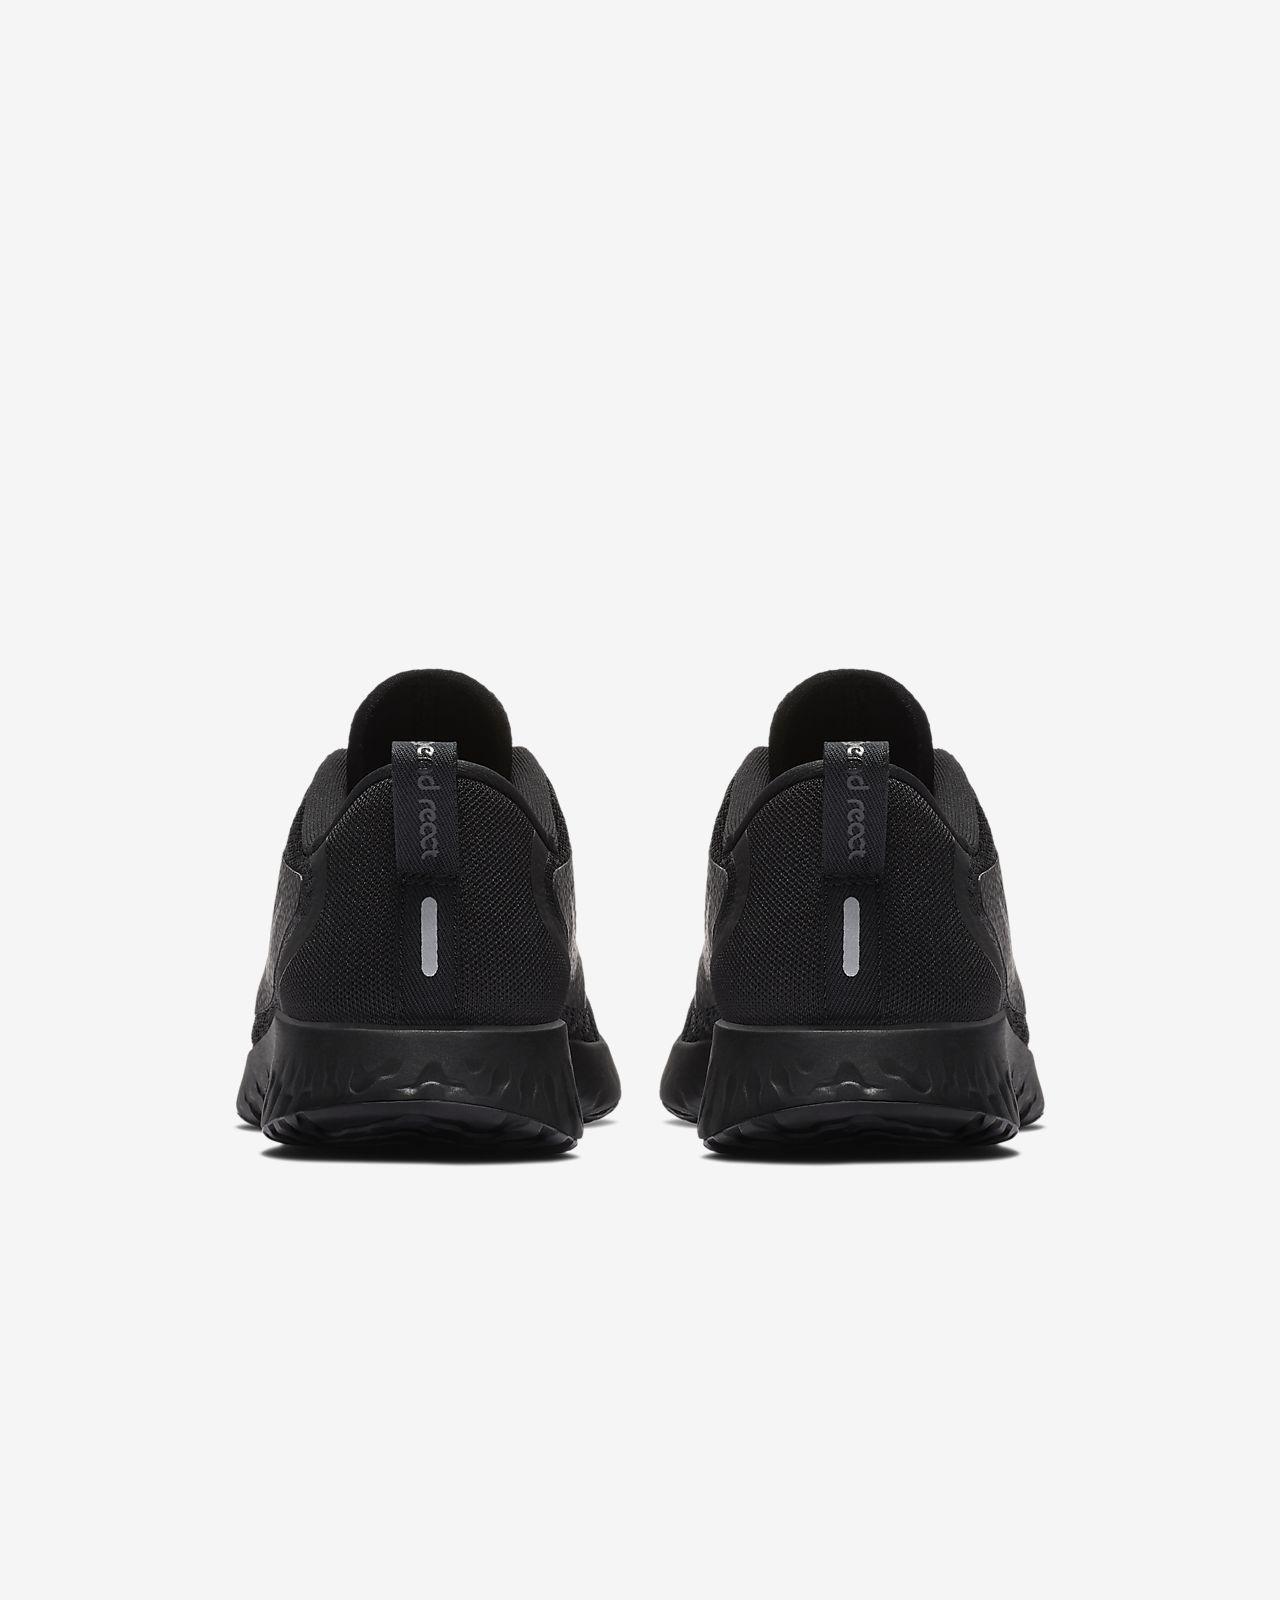 22852c0f18357 Low Resolution Nike Legend React Women's Running Shoe Nike Legend React  Women's Running Shoe